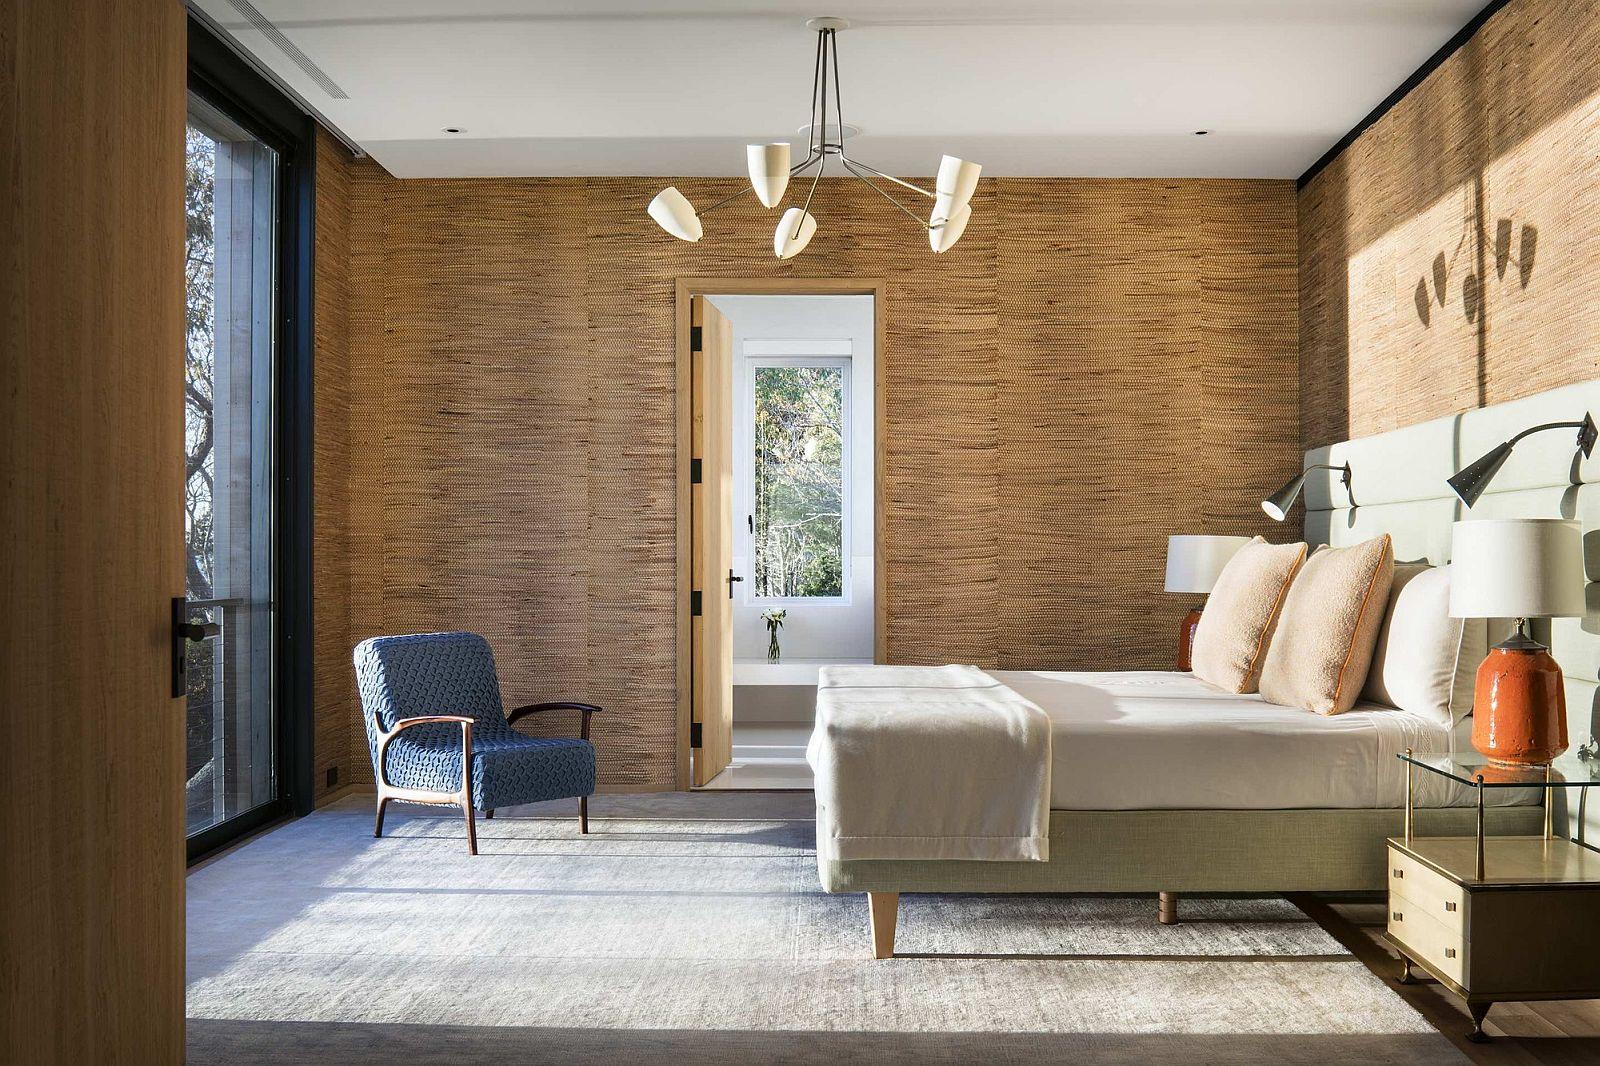 Serene-and-stylish-upper-level-bedroom